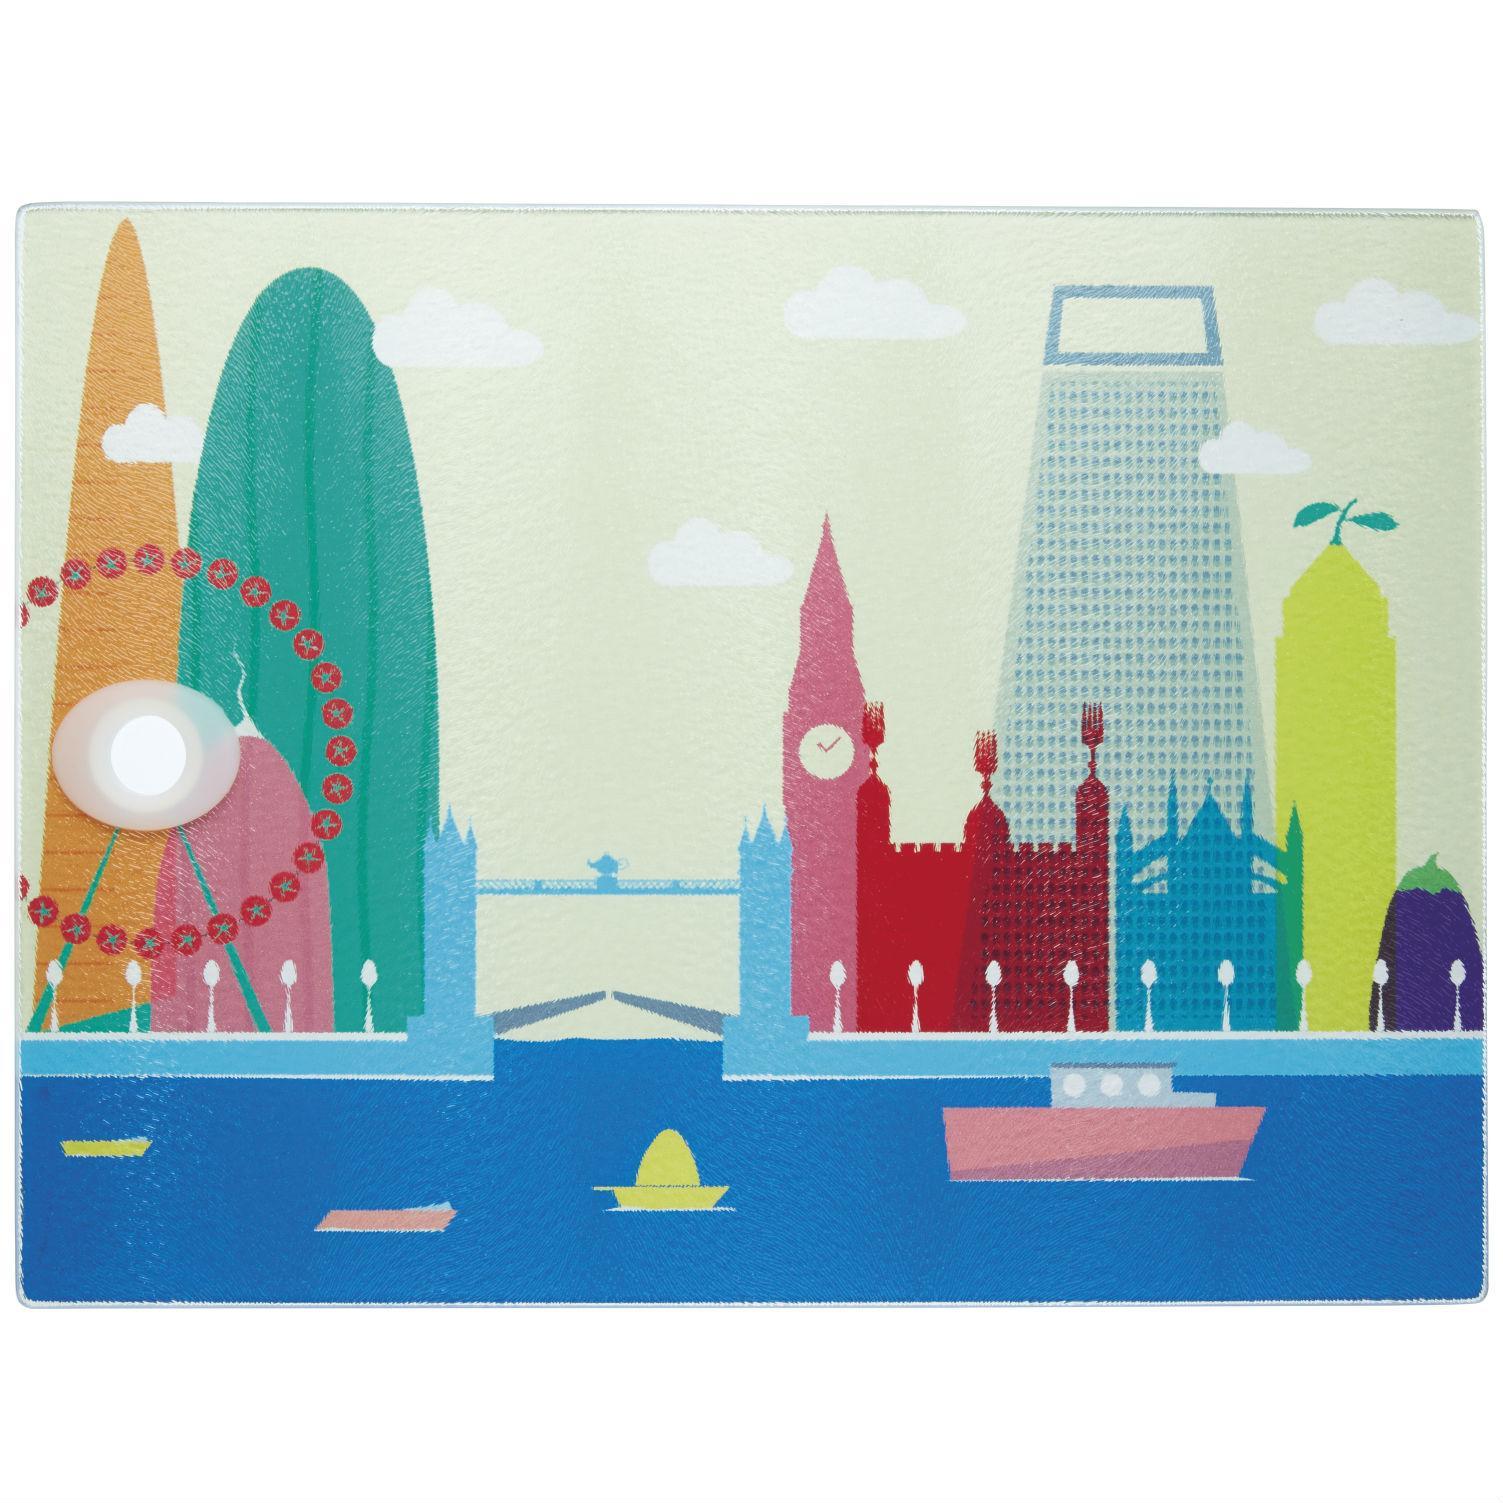 KitchenCraft \'London\' Toughened Glass Worktop Saver, 40 x 30 cm (16 ...